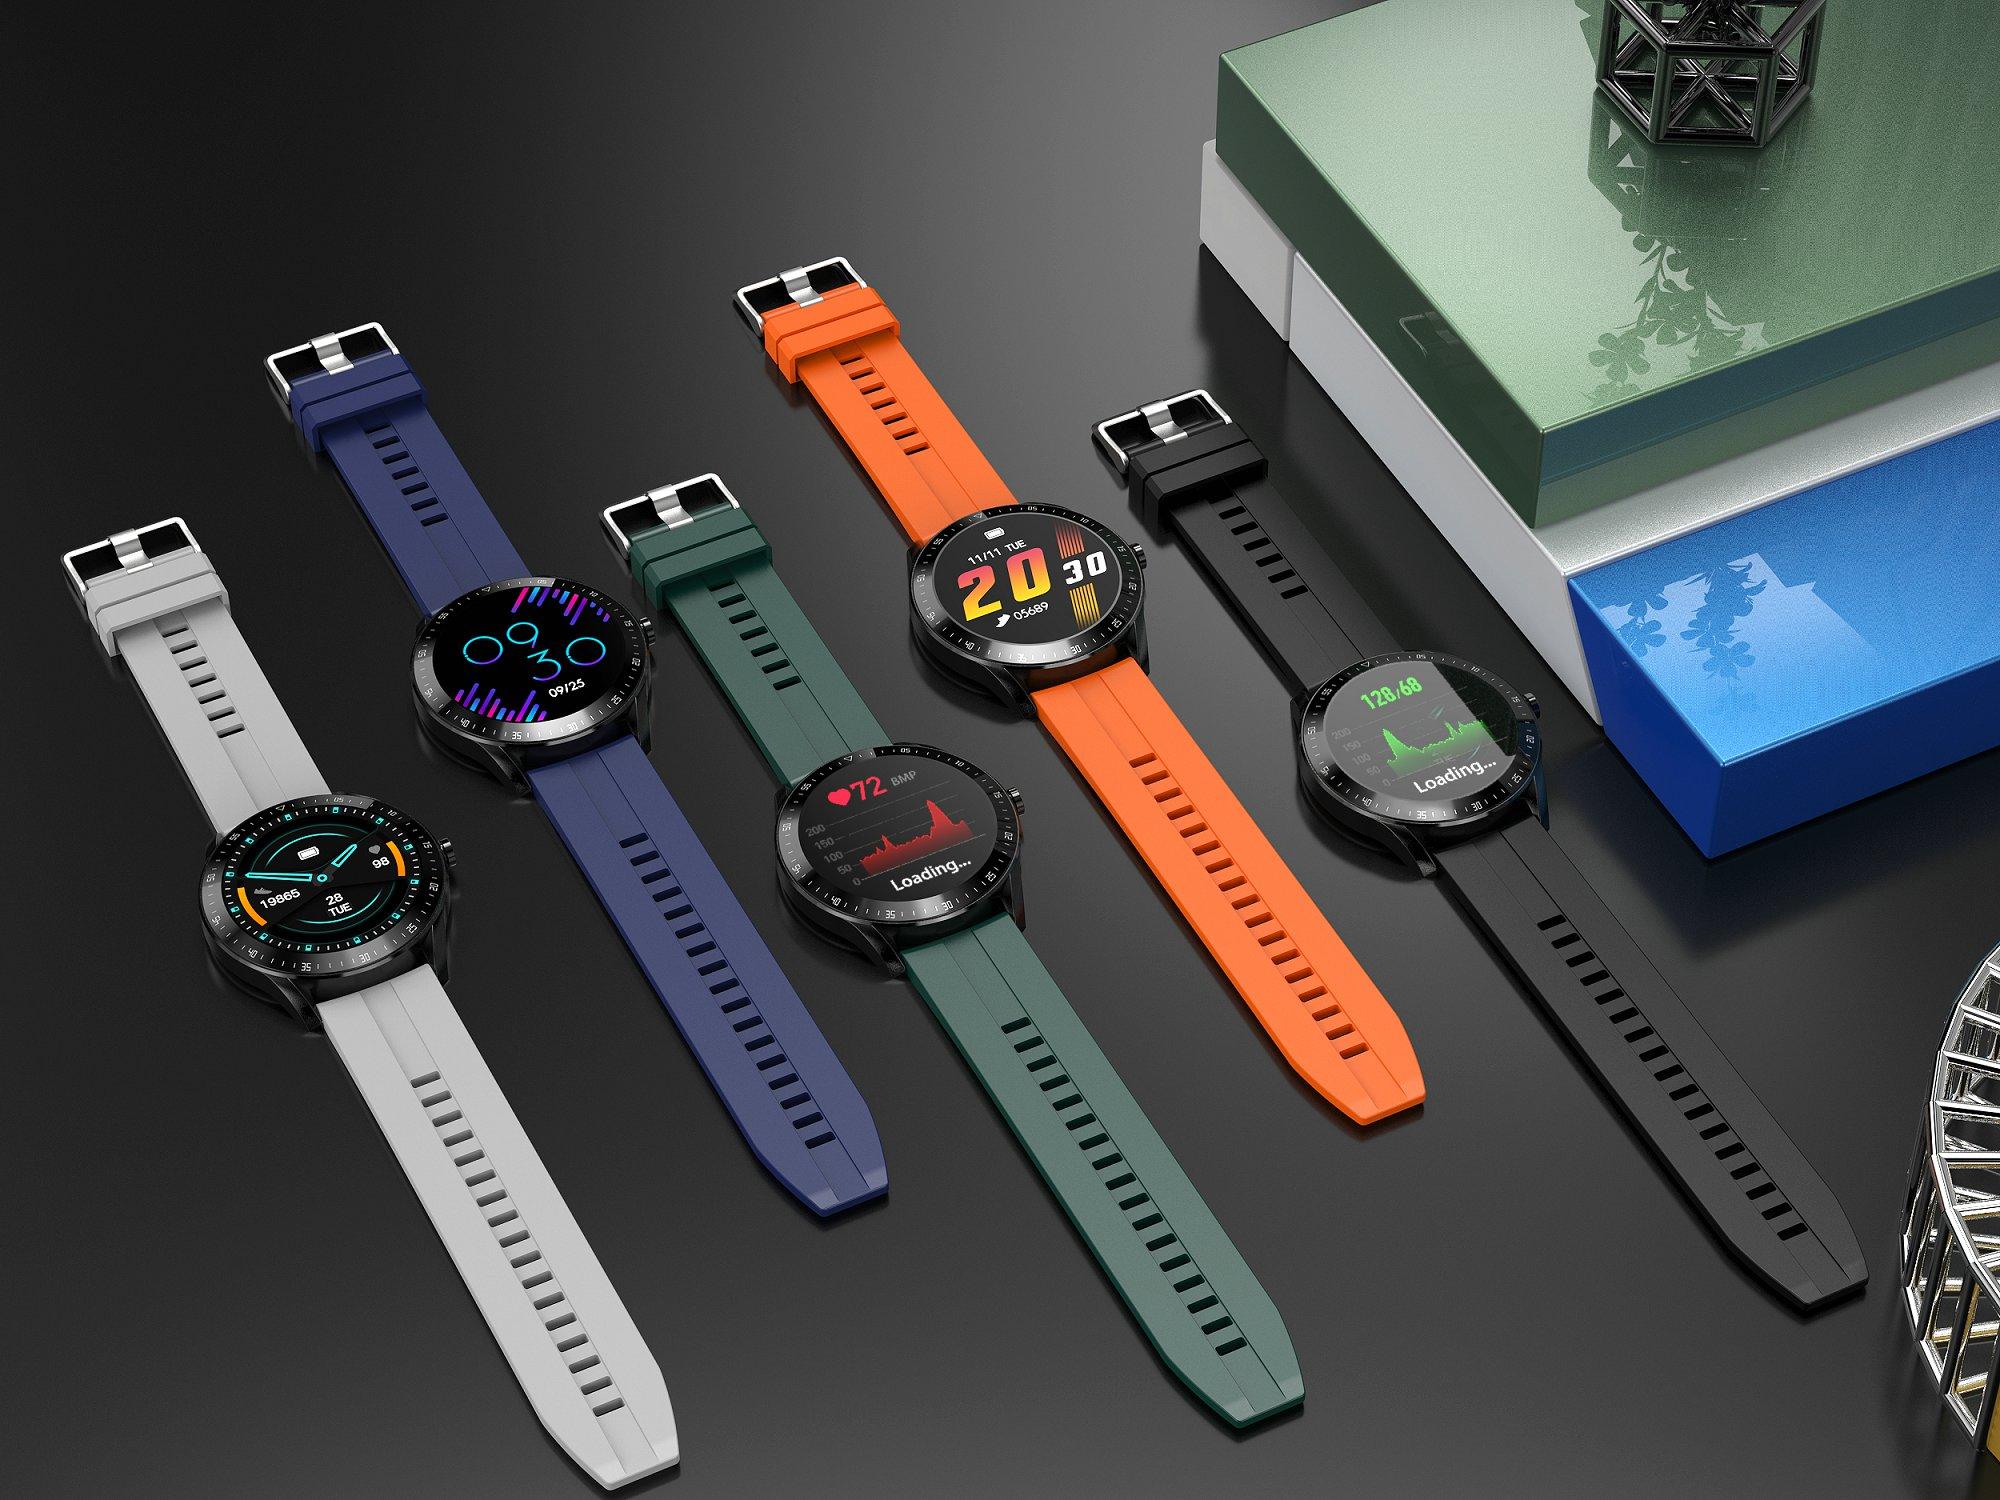 H3686b231dfa54645993ad92bf7477c58j LEMFO F15 Full Touch Screen Smart Watch Men 5D Case